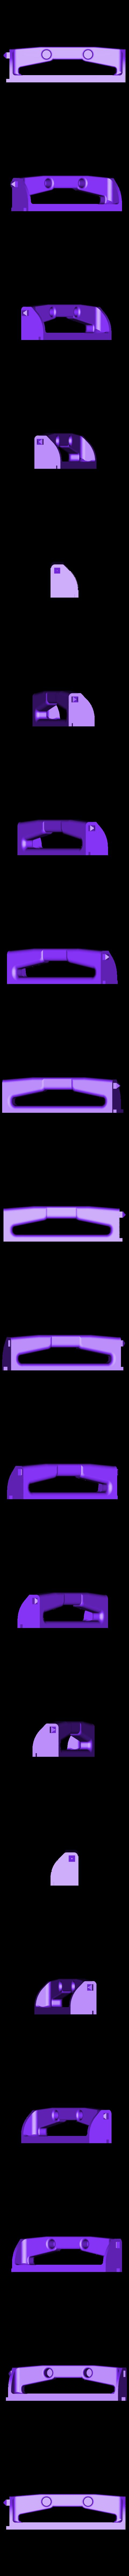 suport verre arS.stl Download free STL file Glass door • Template to 3D print, JMC3D